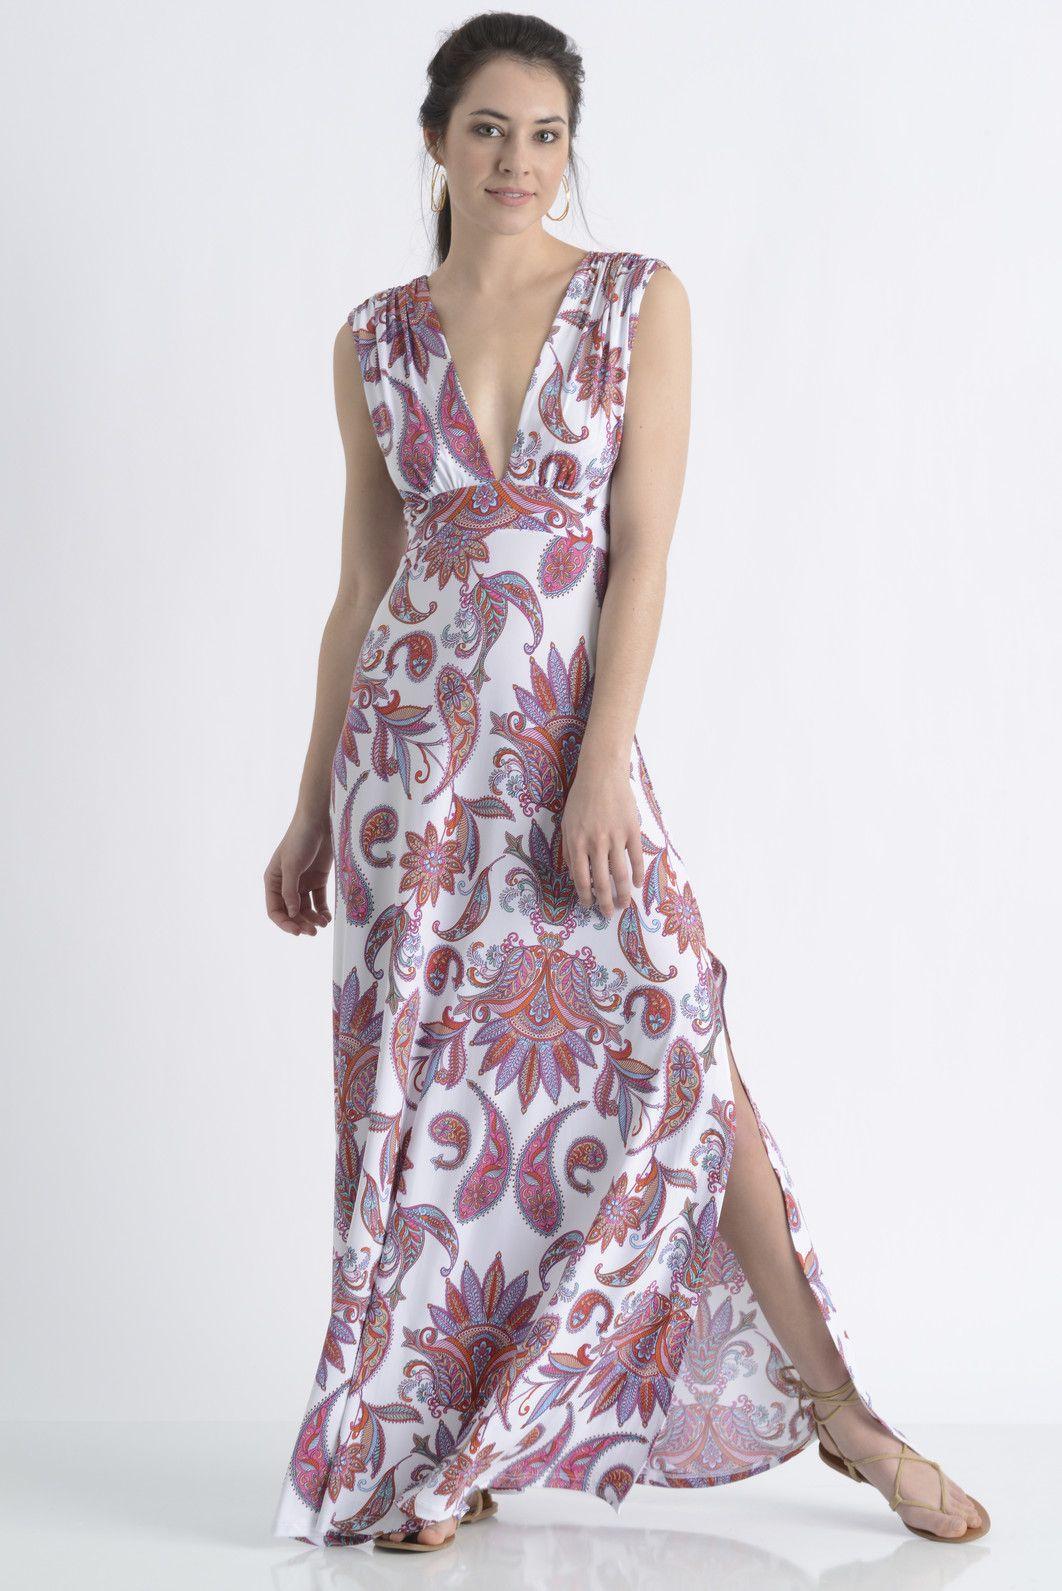 Veronica m paisley plunge maxi dress south moon under dresses